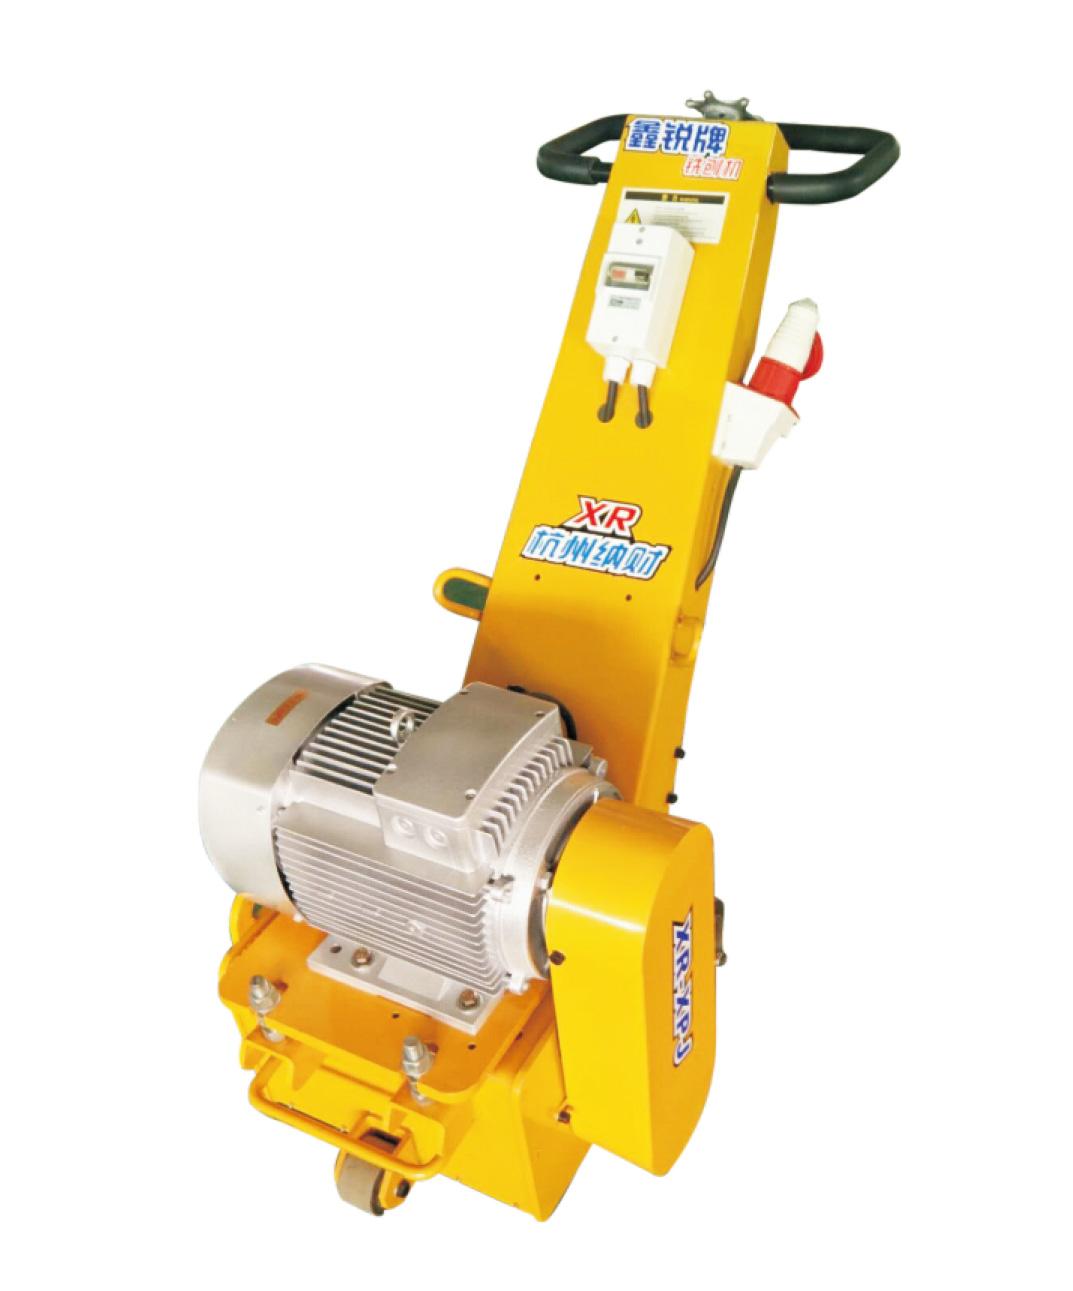 NC300 電動款 銑刨機